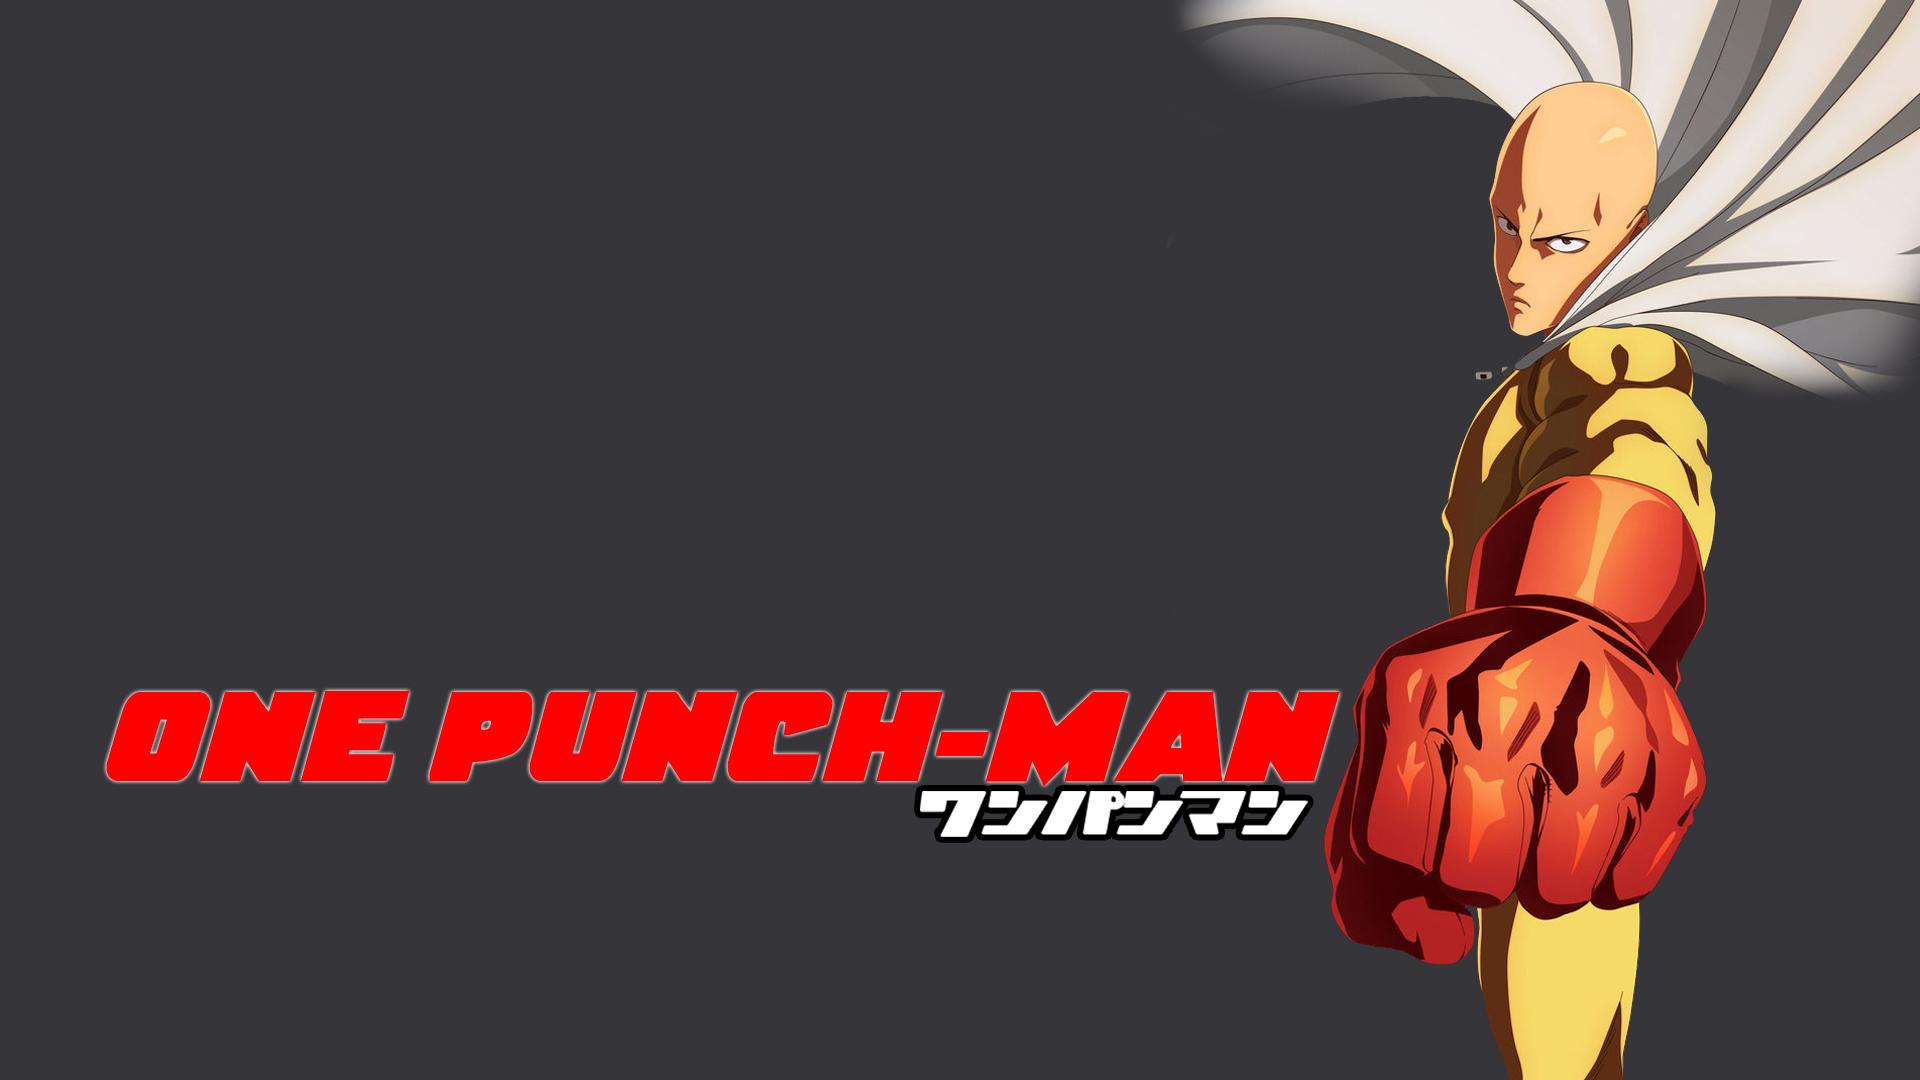 One punch man wallpaper hd wallpapersafari - Funny one punch man wallpaper ...